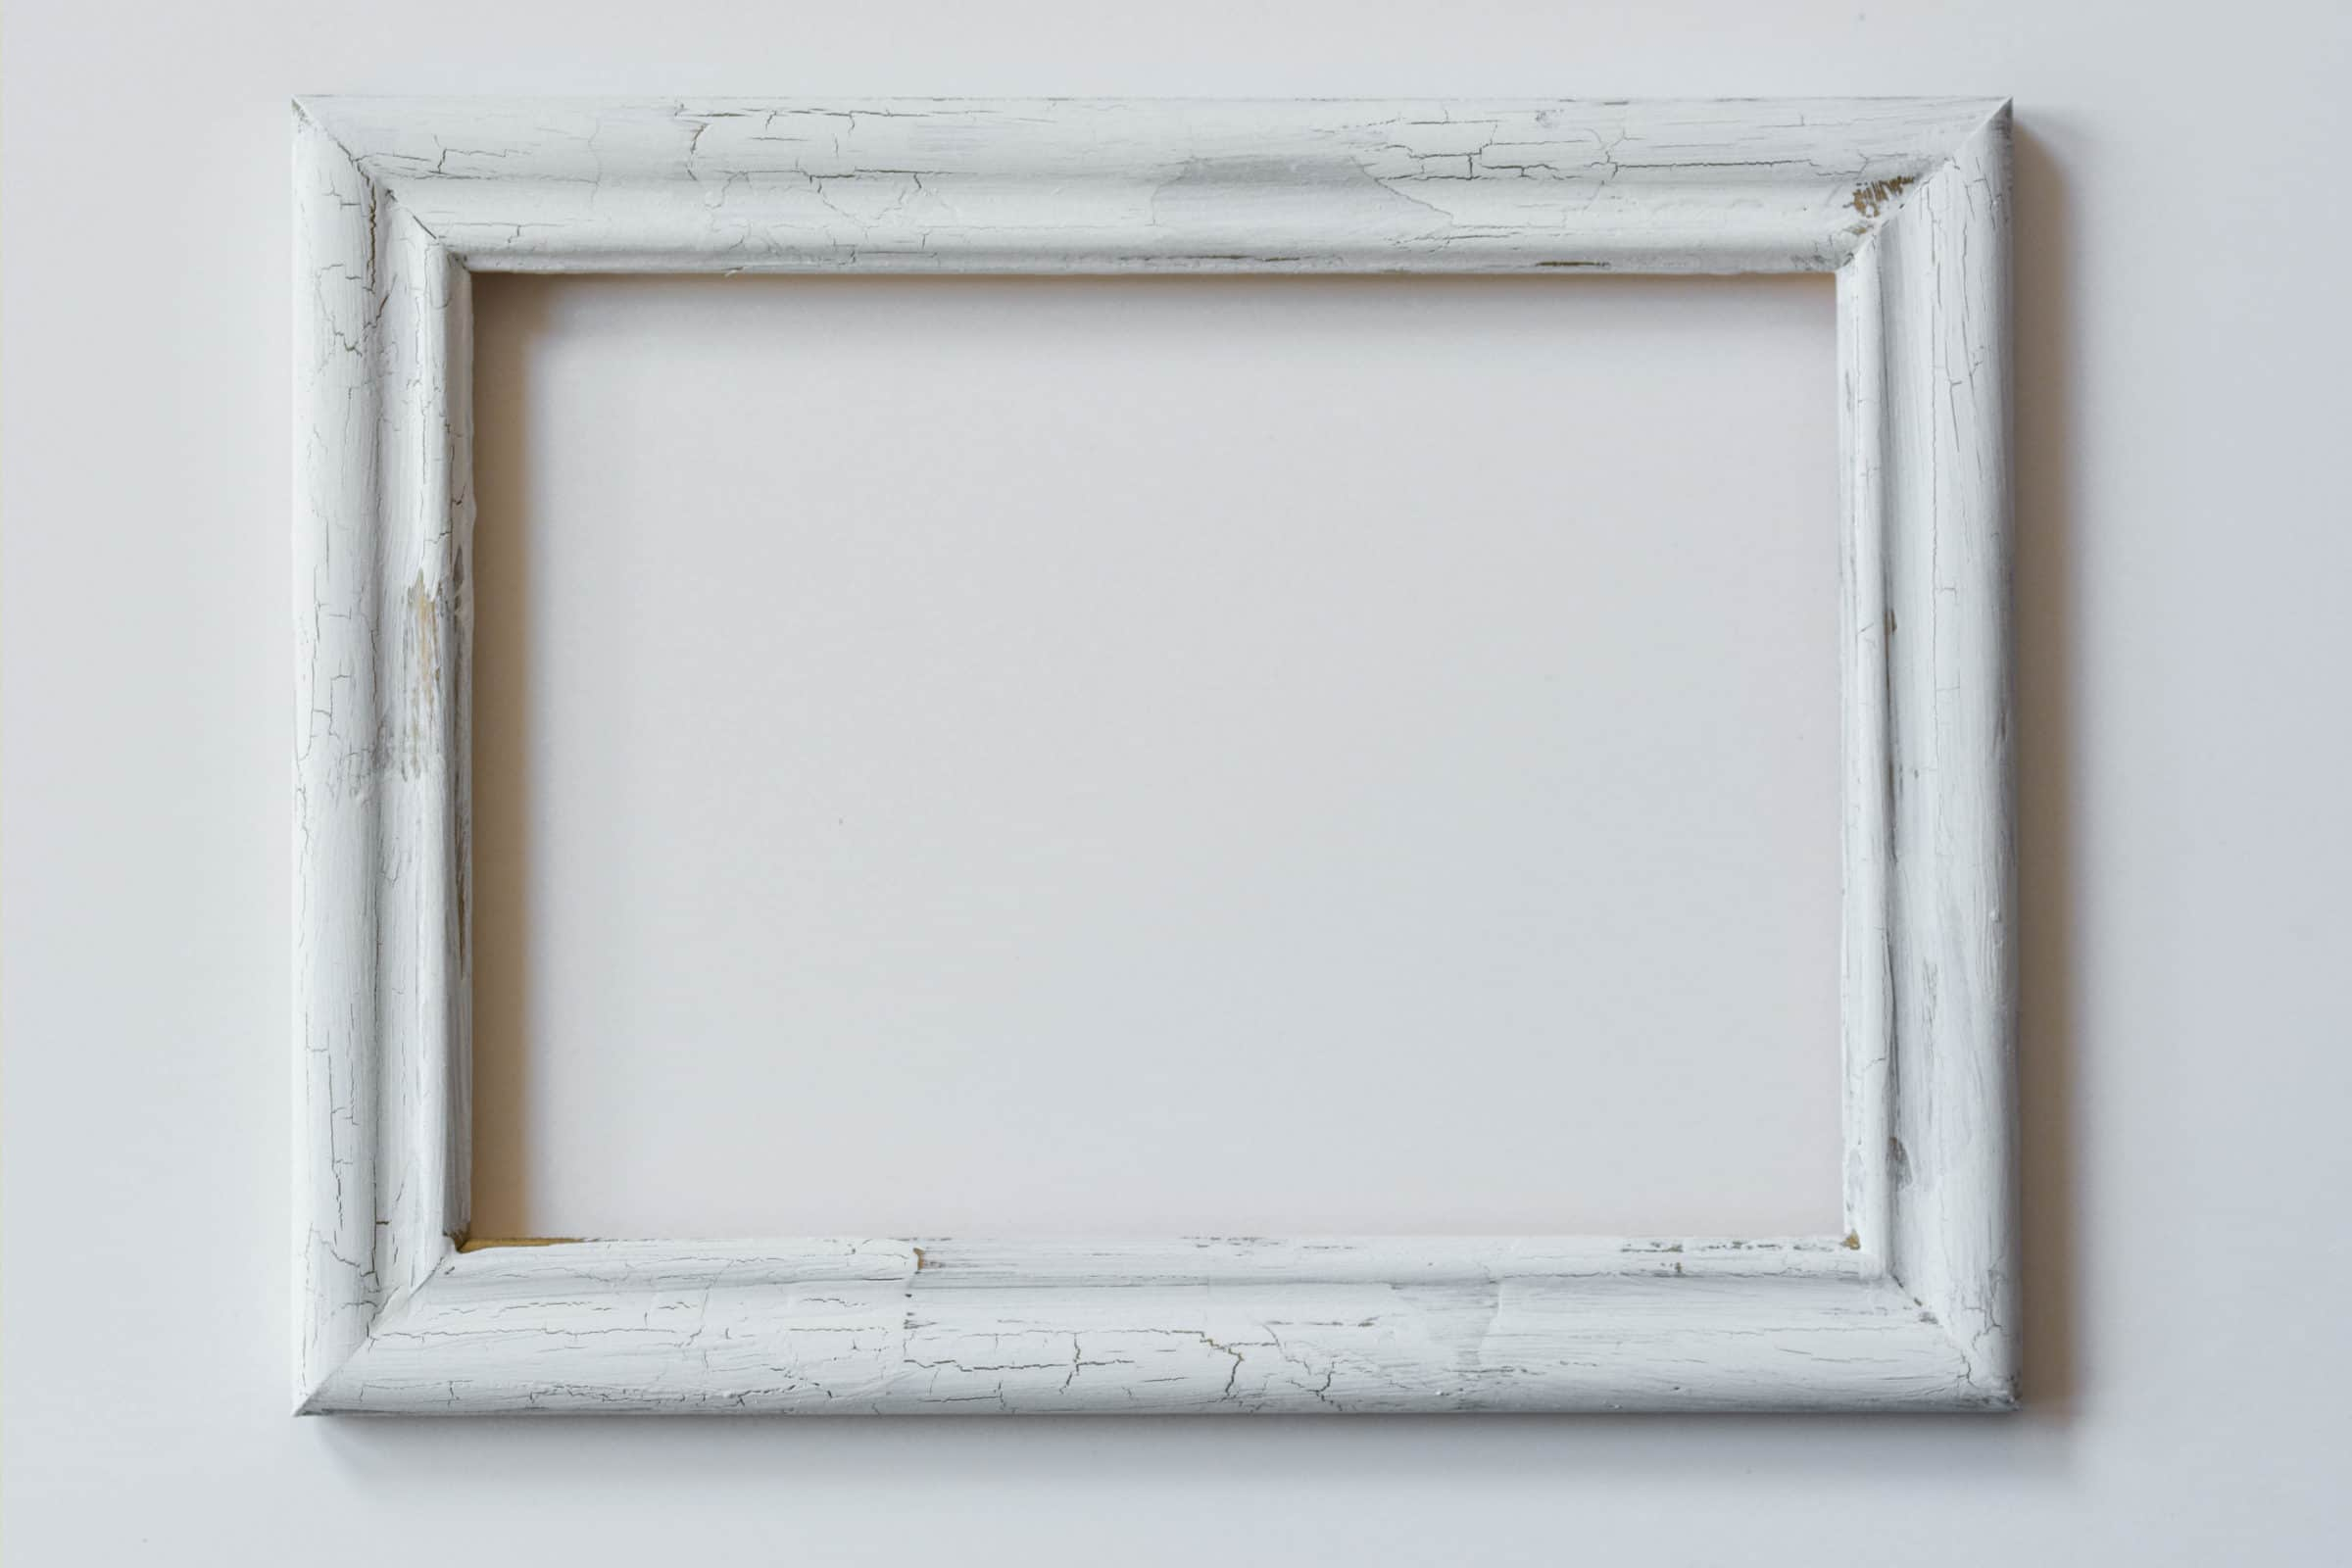 Antik Crackle paint effect on frame